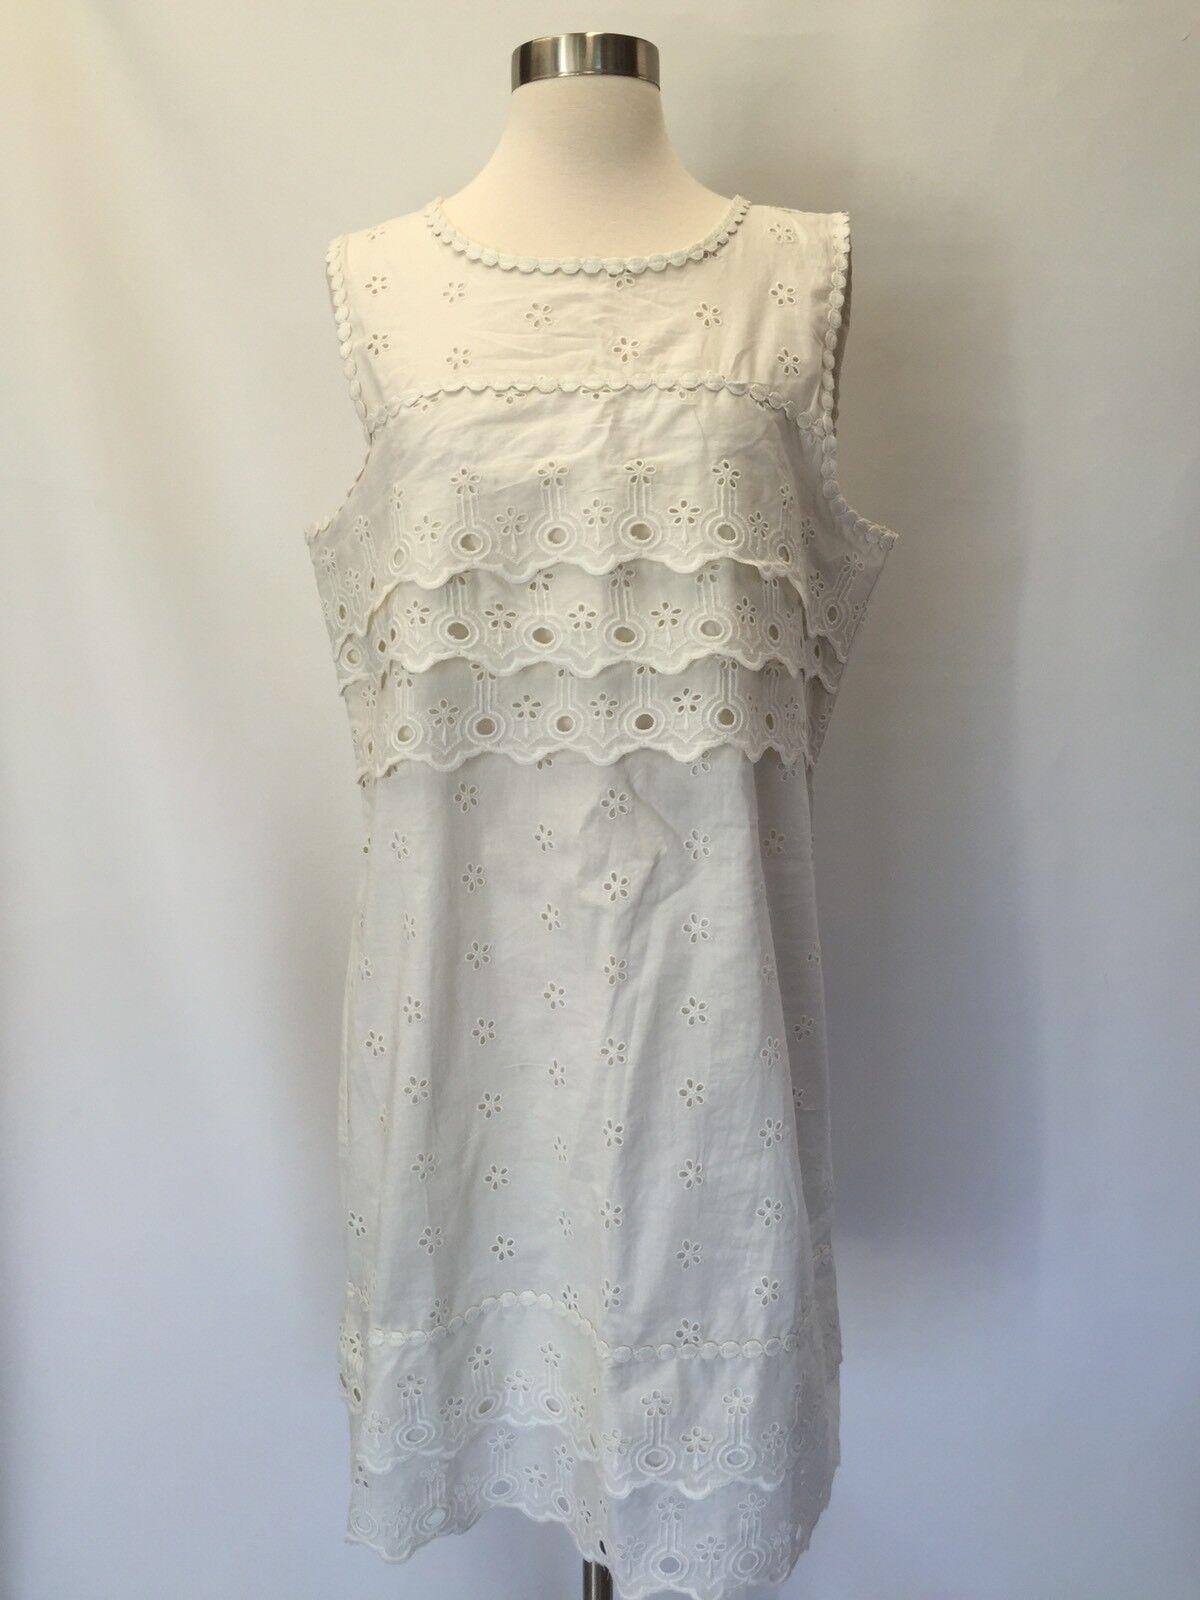 NWT J.Crew Tierot Eyelet Dress Lace Shift Ivory Größe 12 G8475